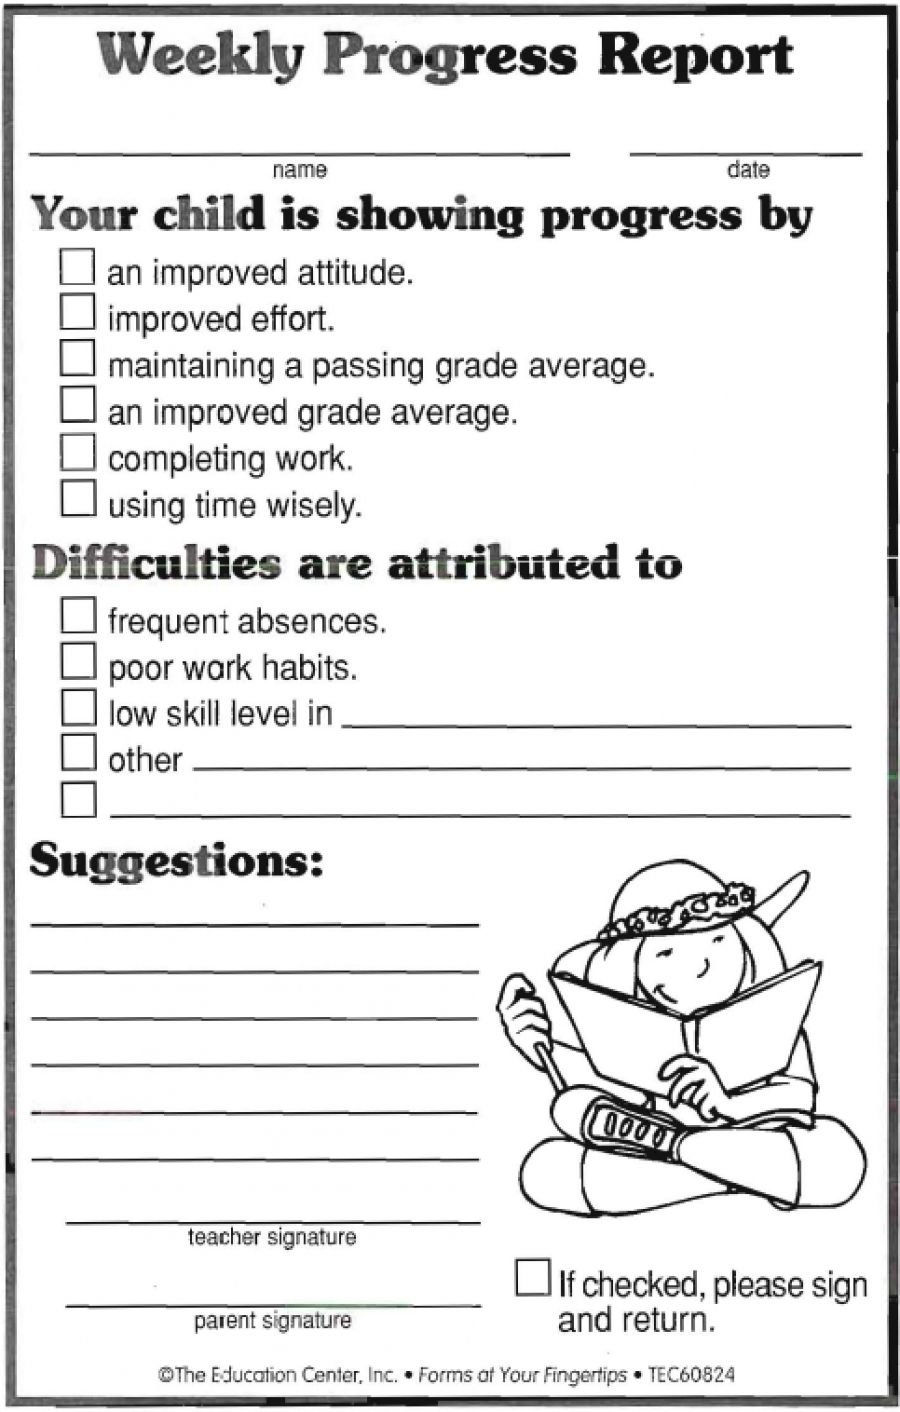 Weekly Progress Report | Ideas | Progress Report, Progress Throughout Daily Behavior Report Template